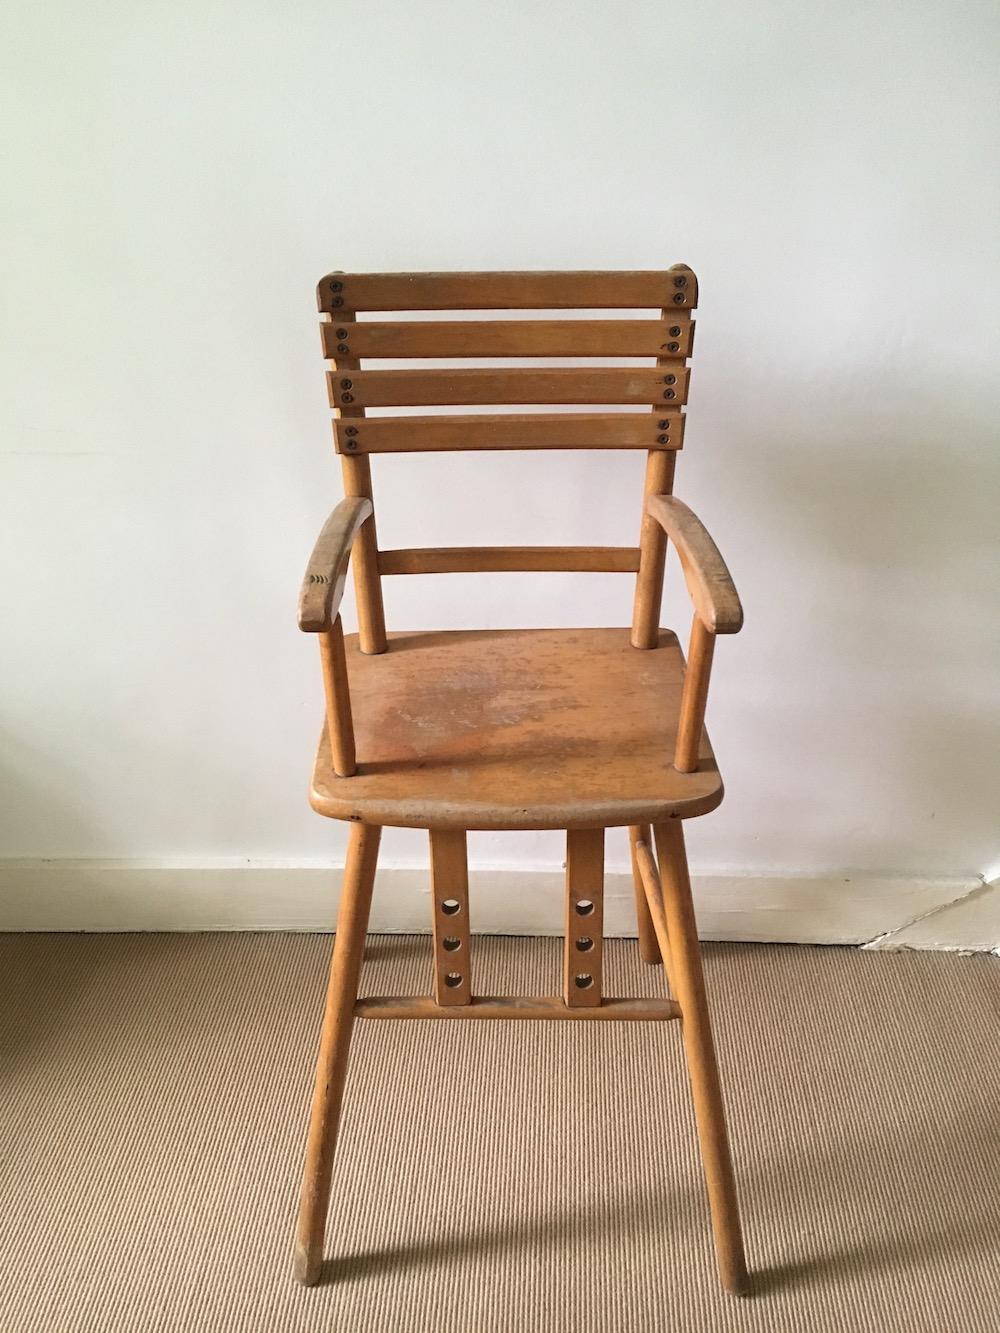 vintage chair, wooden chair for children, high chair, high chair for child, vintage high chair